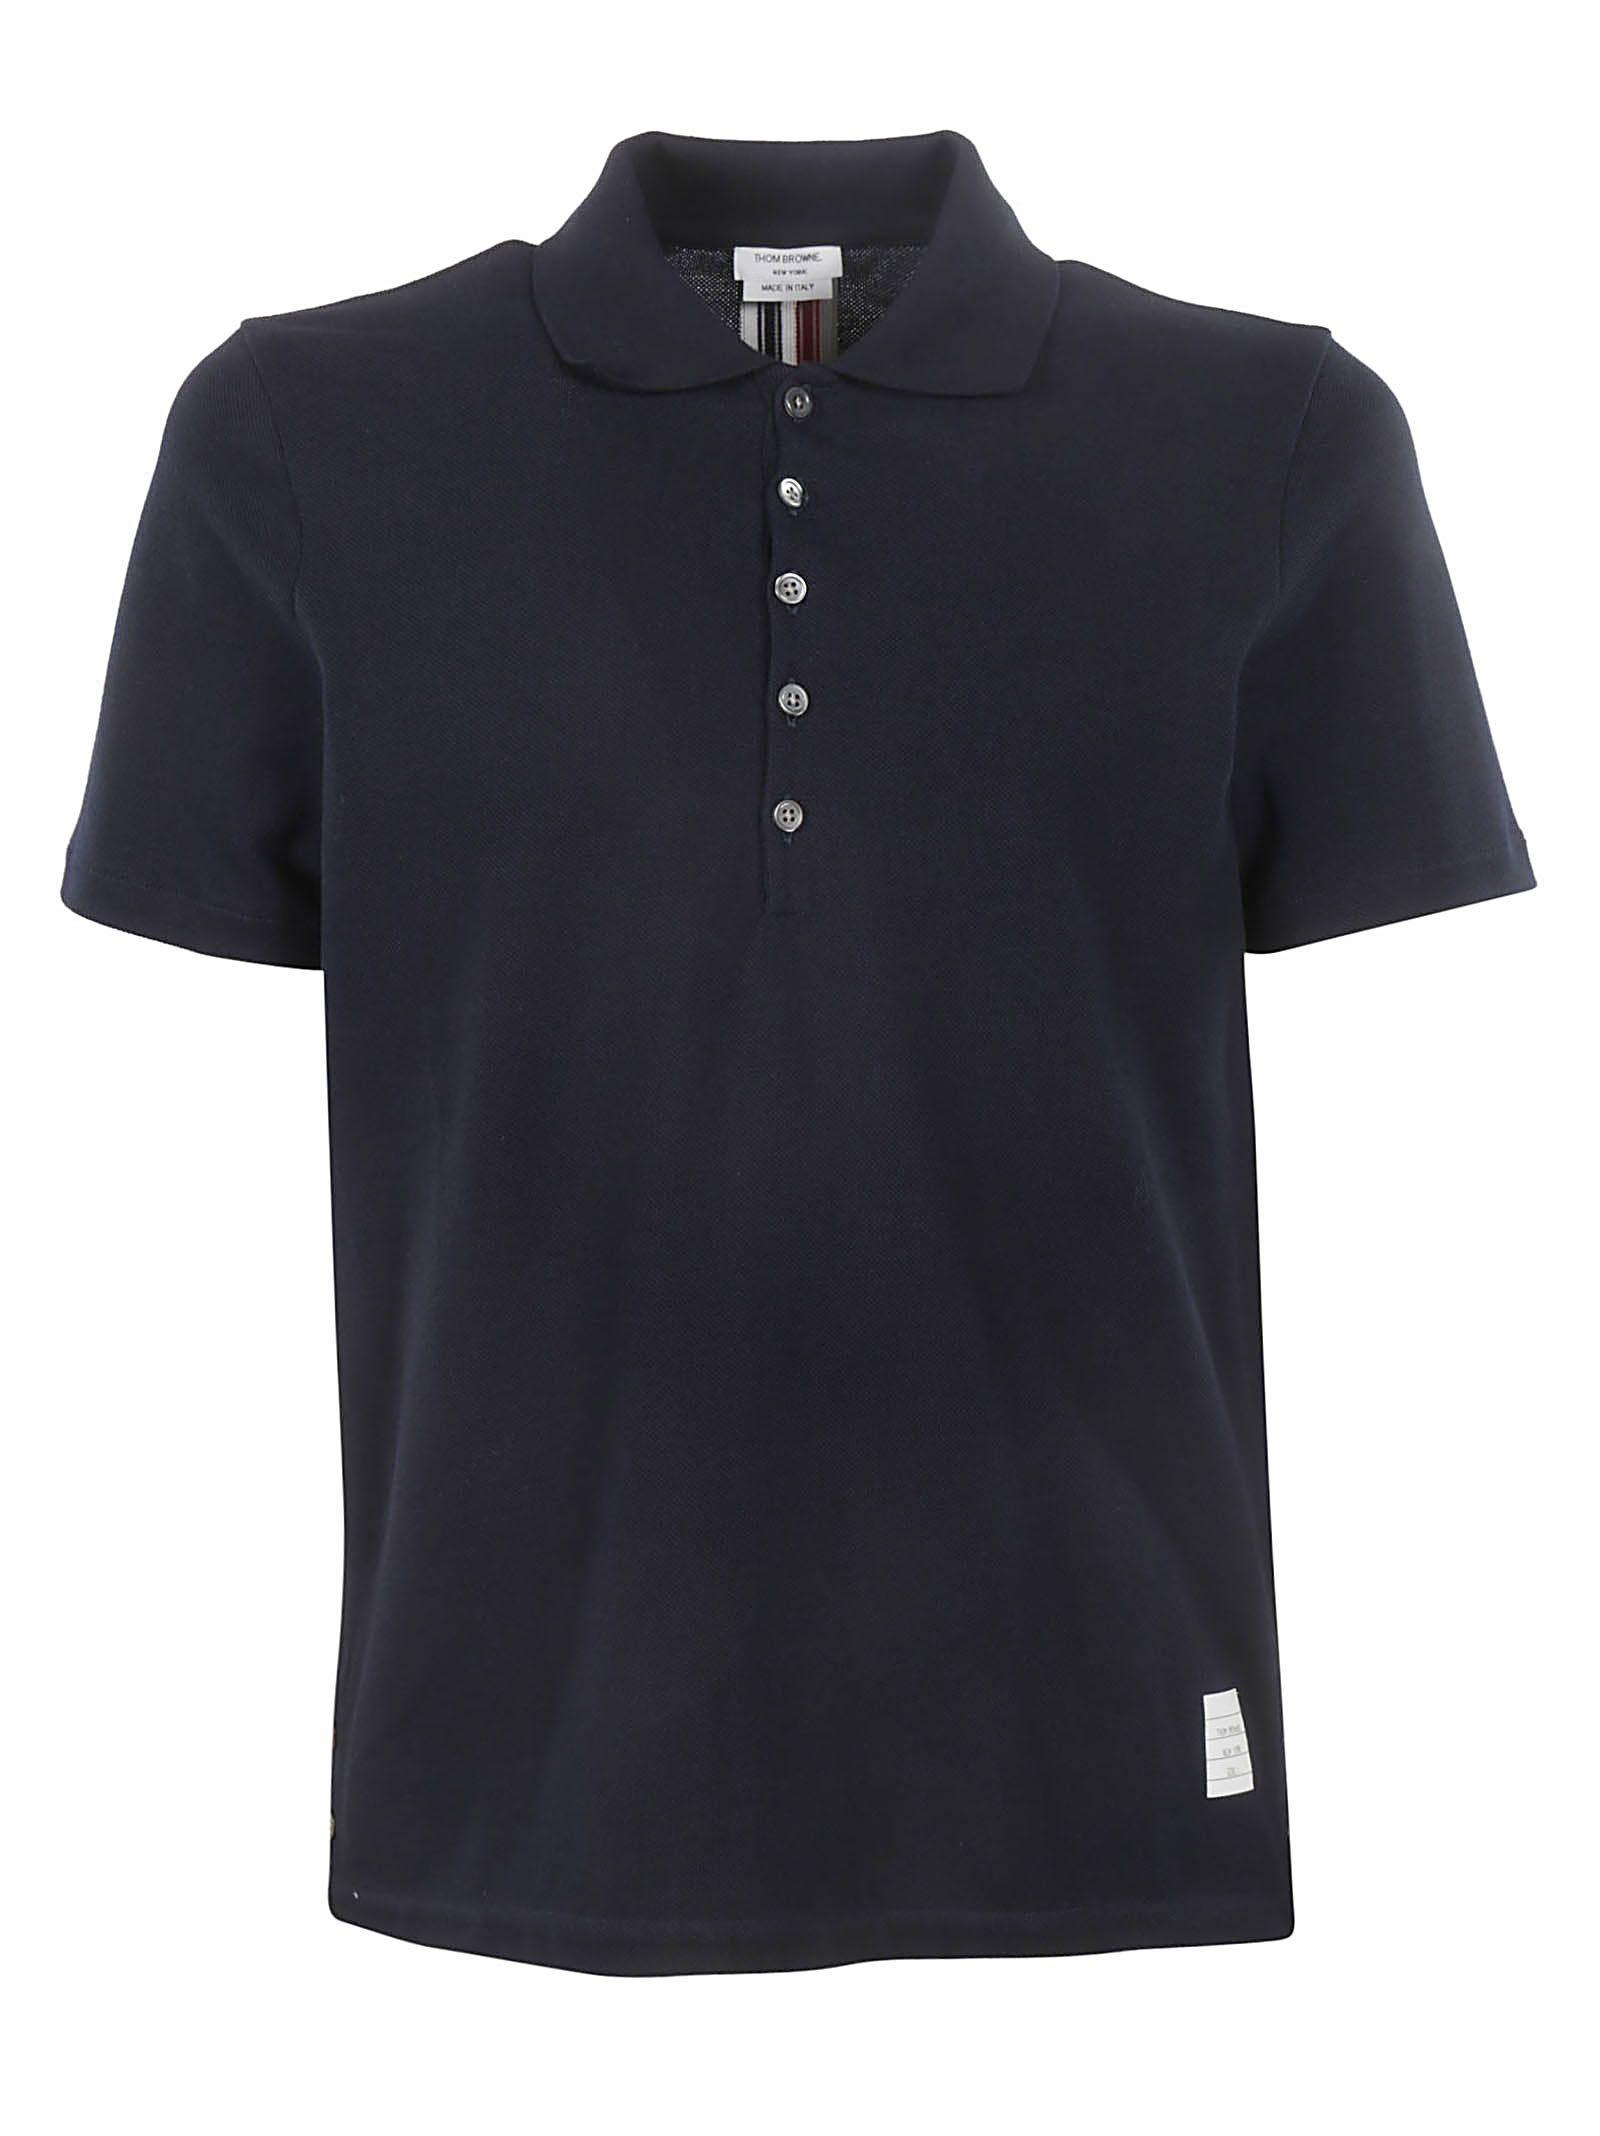 556f7861 Thom Browne Thom Browne Signature Stripe Polo Shirt - BLUE ...